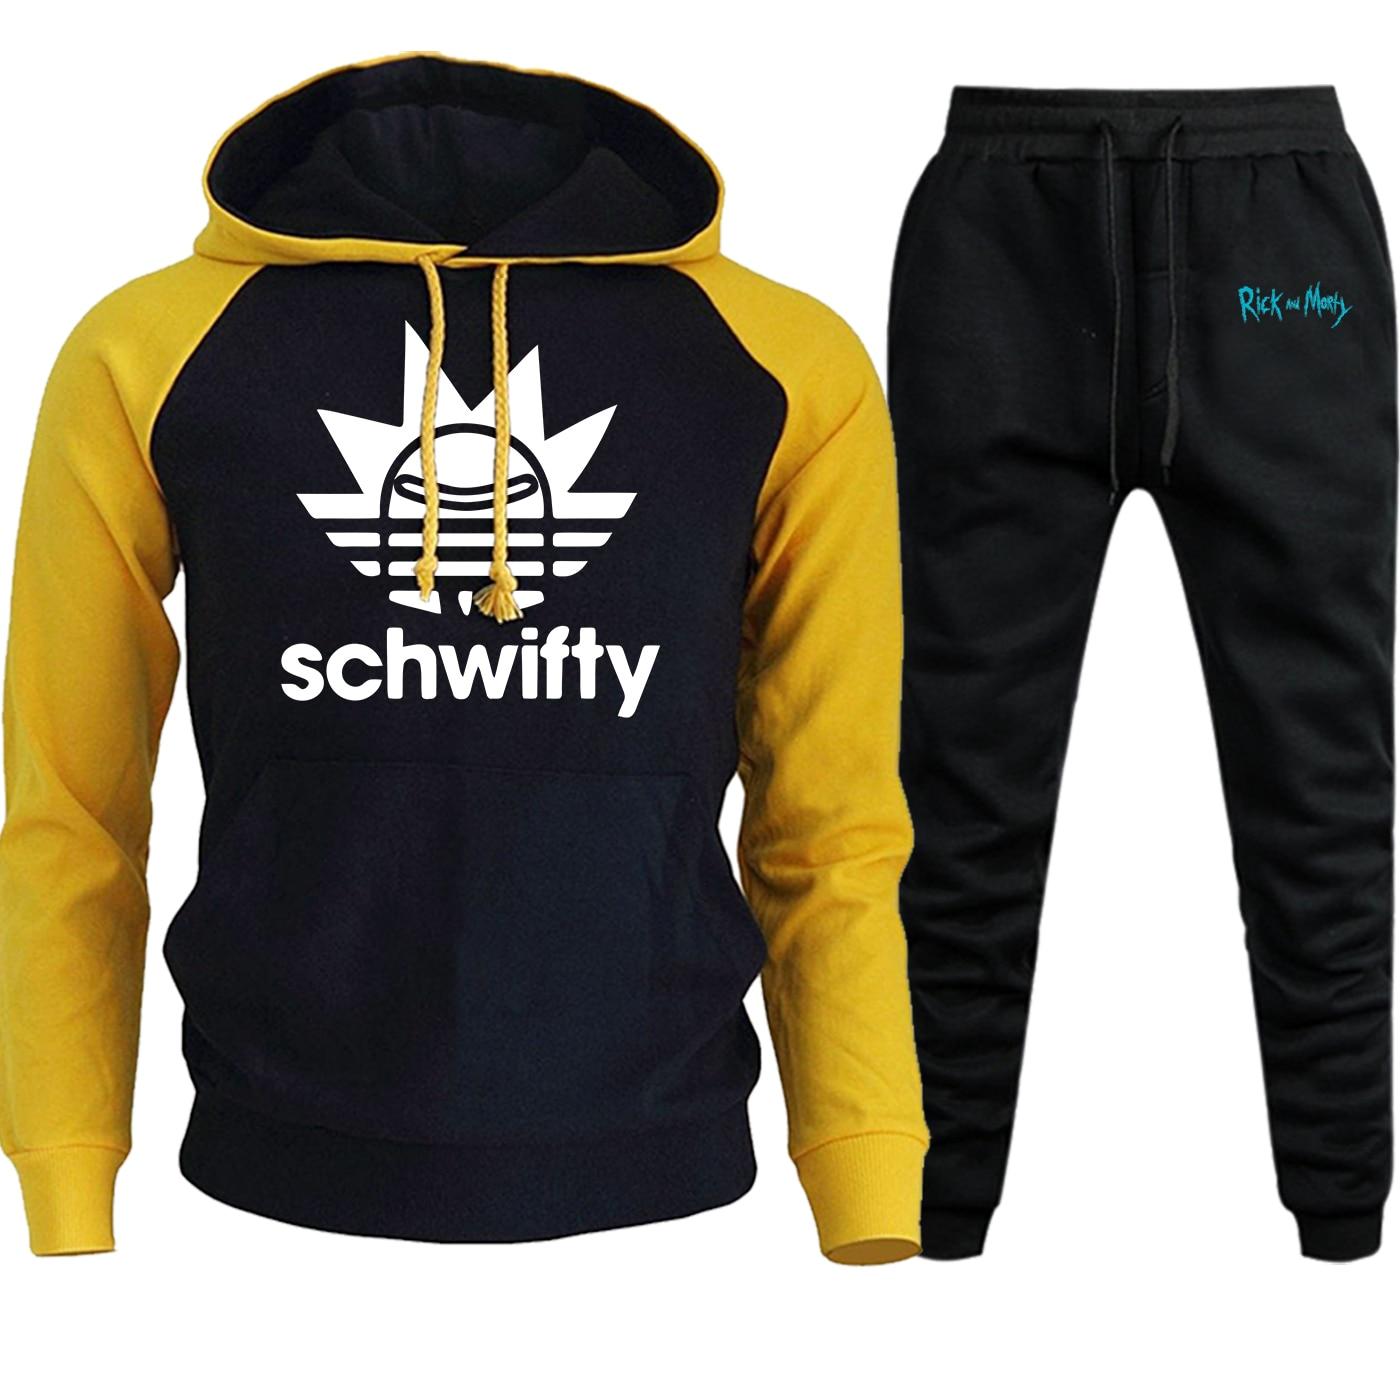 Rick And Morty Streetwear Mens Raglan Hoodies Autumn Winter 2019 Suit Cartoon Fleece Pullover Hip Hop Hooded+Pants 2 Piece Set